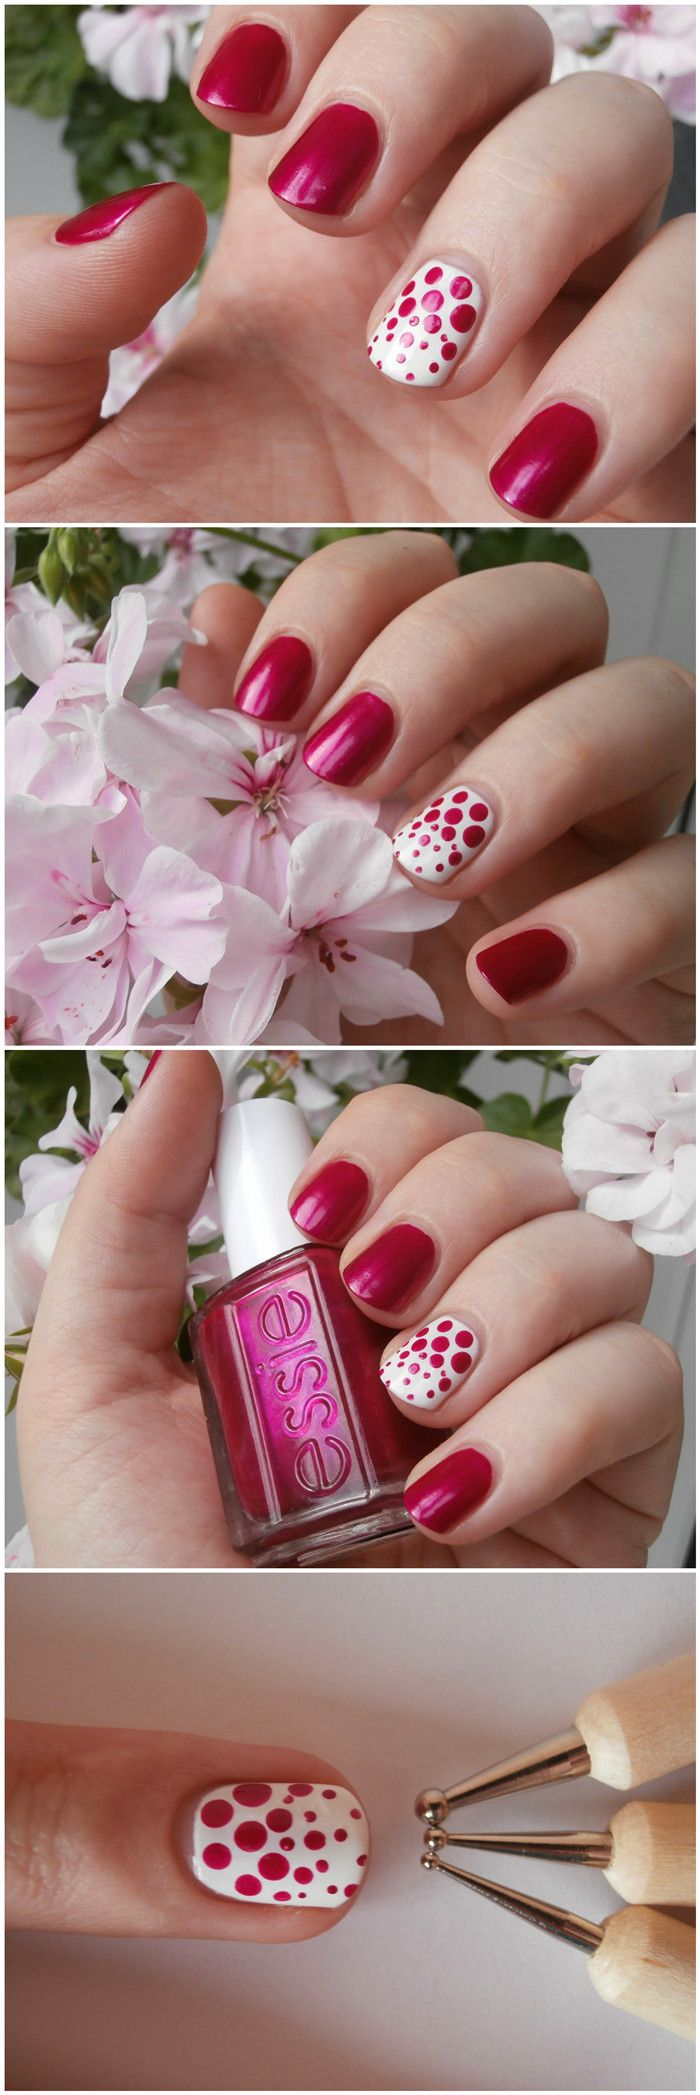 3d Nail Art where to buy 3d nail art supplies : 25+ unique Nail art tools ideas on Pinterest | Nail art dotting ...